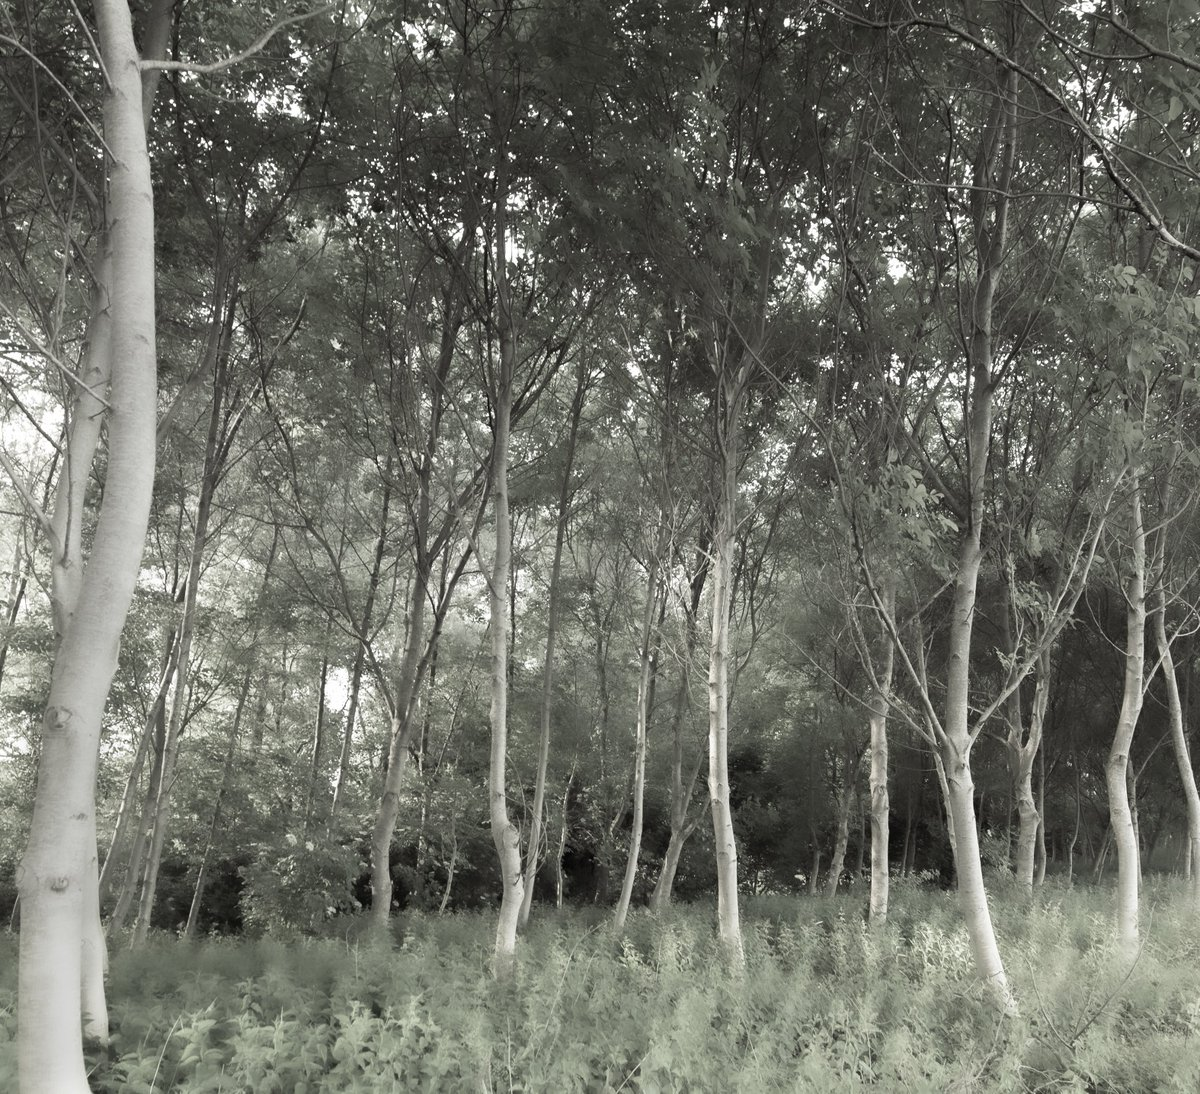 Project 10.000, day 542: Every mind is a kingdom of unmapped mysteries  20mm F5.6 1/125 ISO400 +f1.7   #NatureIsEverywhere #Nature #natuurpunt #naarbuiten   #PhotographyIsLife #TravelTheWorld #PostcardsFromTheWorld #wildlifephotography   #biodiversity #naturephotographerpic.twitter.com/IhCXex1hyN